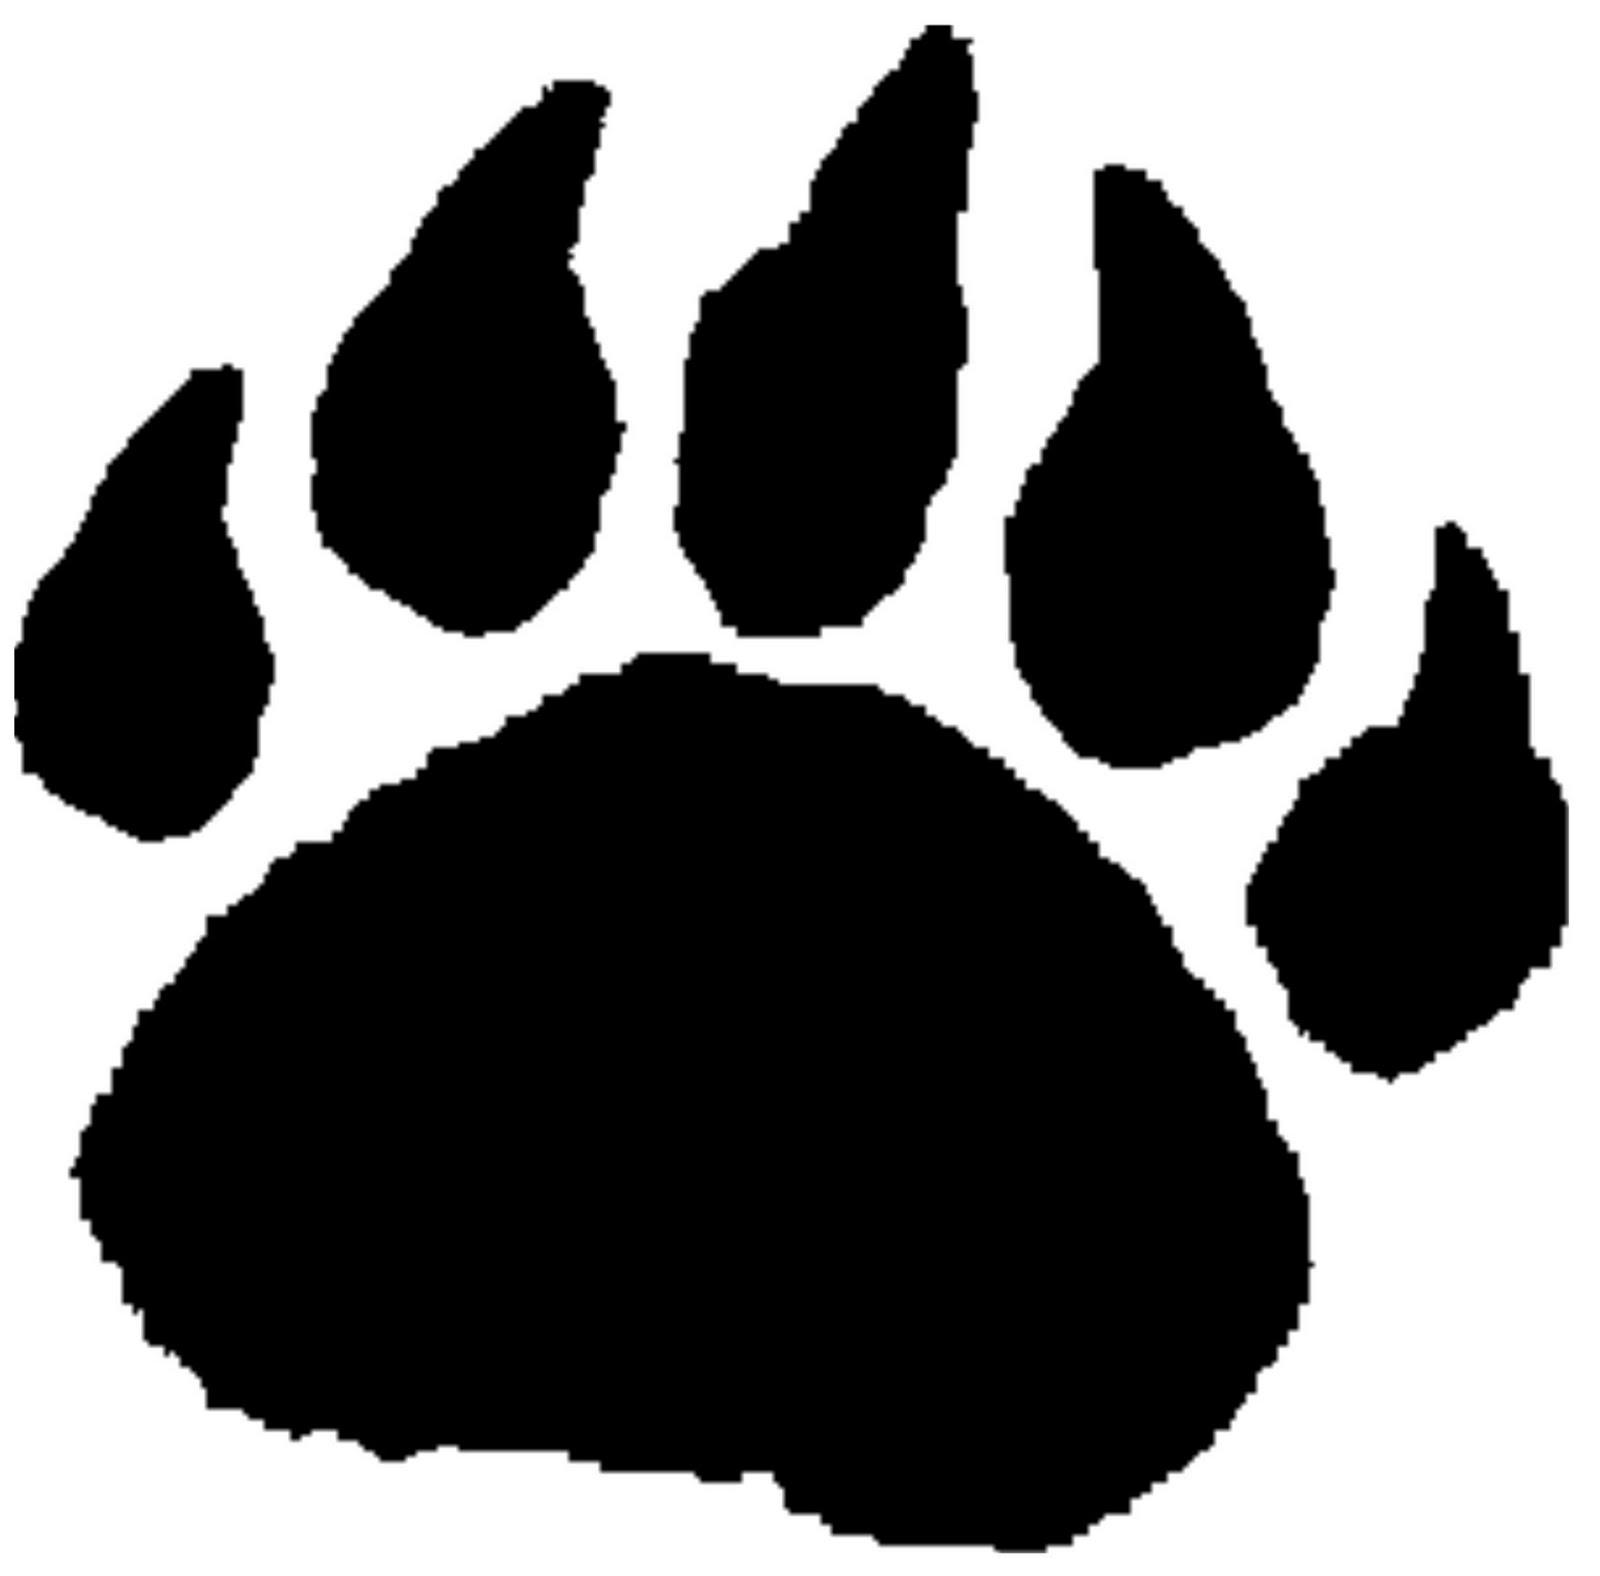 Pawprint clipart bear cub. Paw print png clip